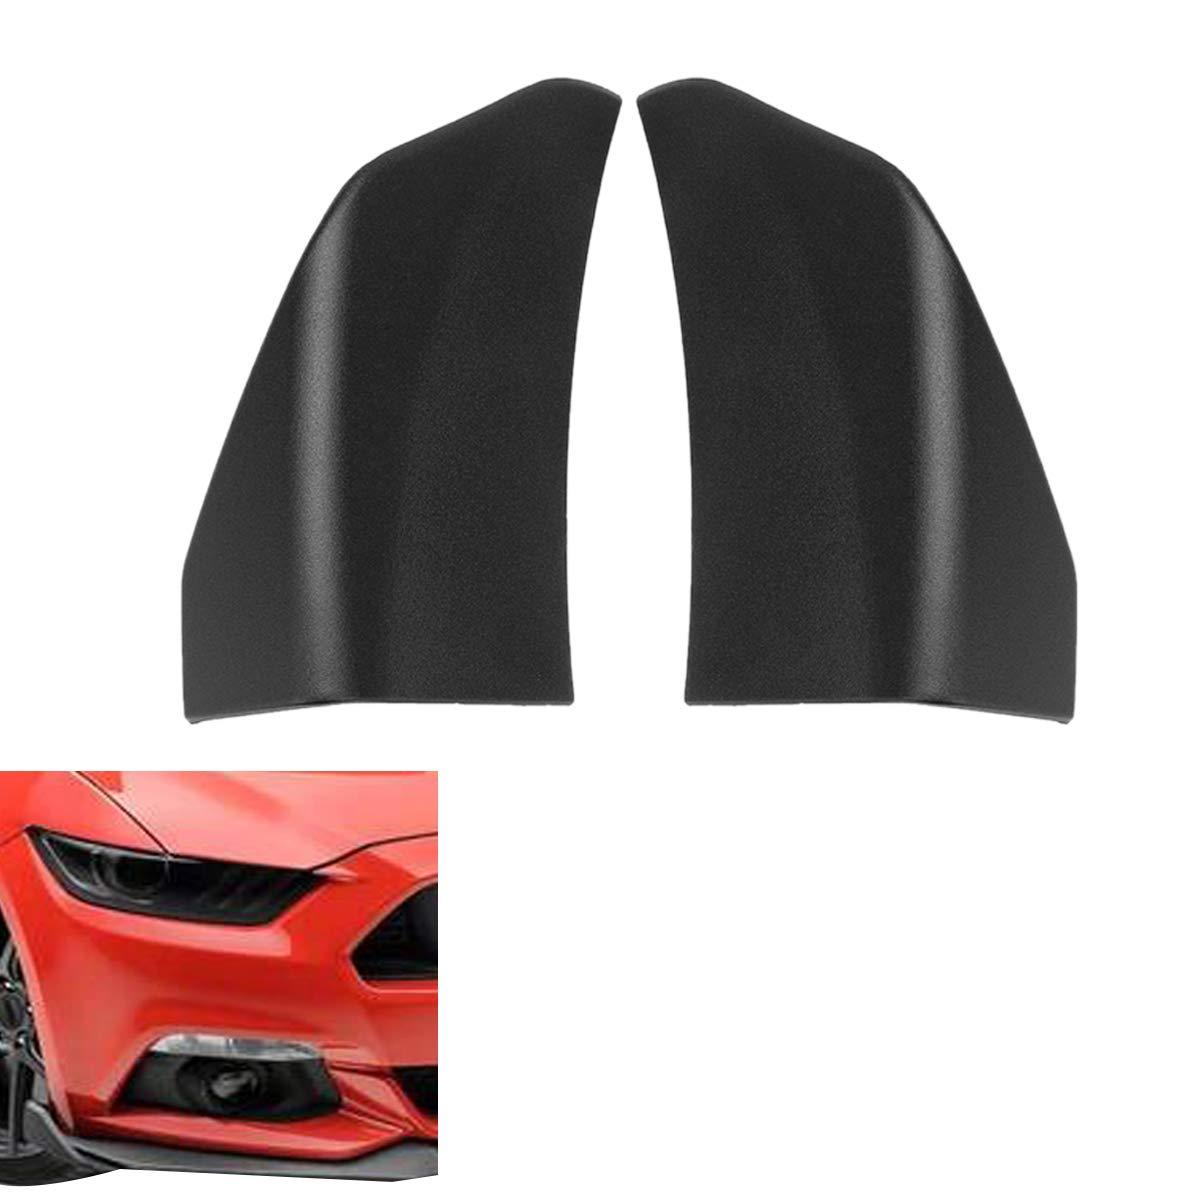 Etase ala Decorativa del Parachoques Delantero del Coche Spoiler para Mustang 2015-2017